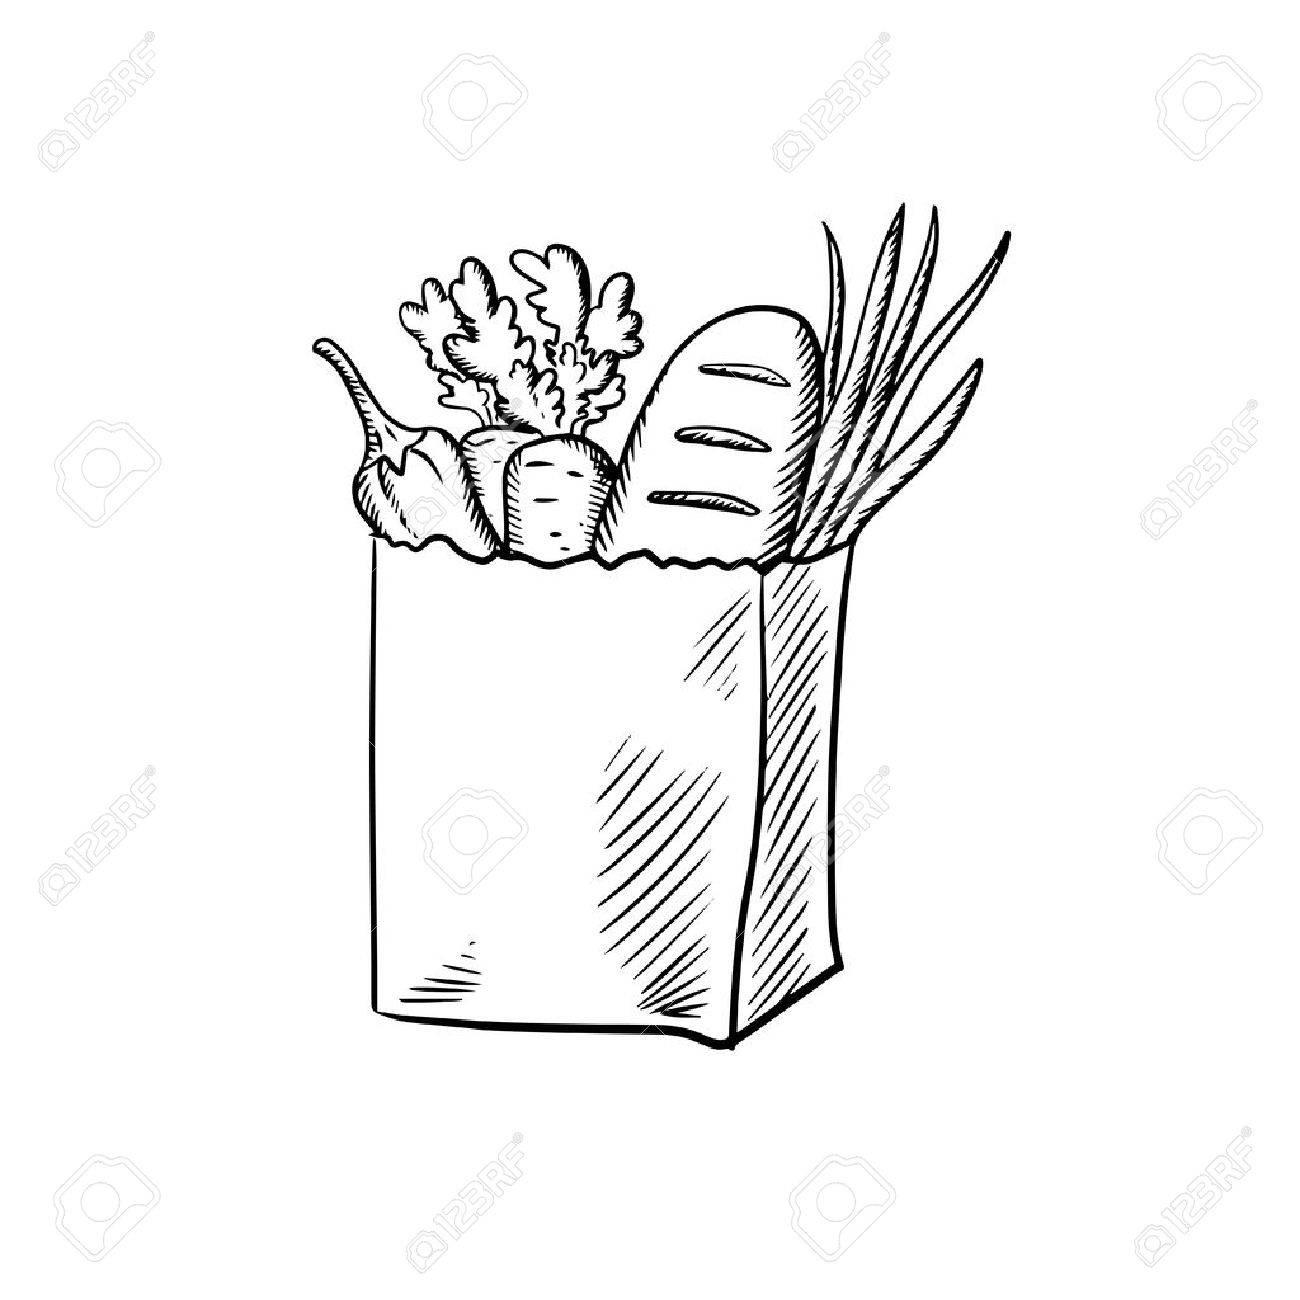 1300x1300 Paper Shopping Bag With Fresh Carrot, Green Onion, Zucchini